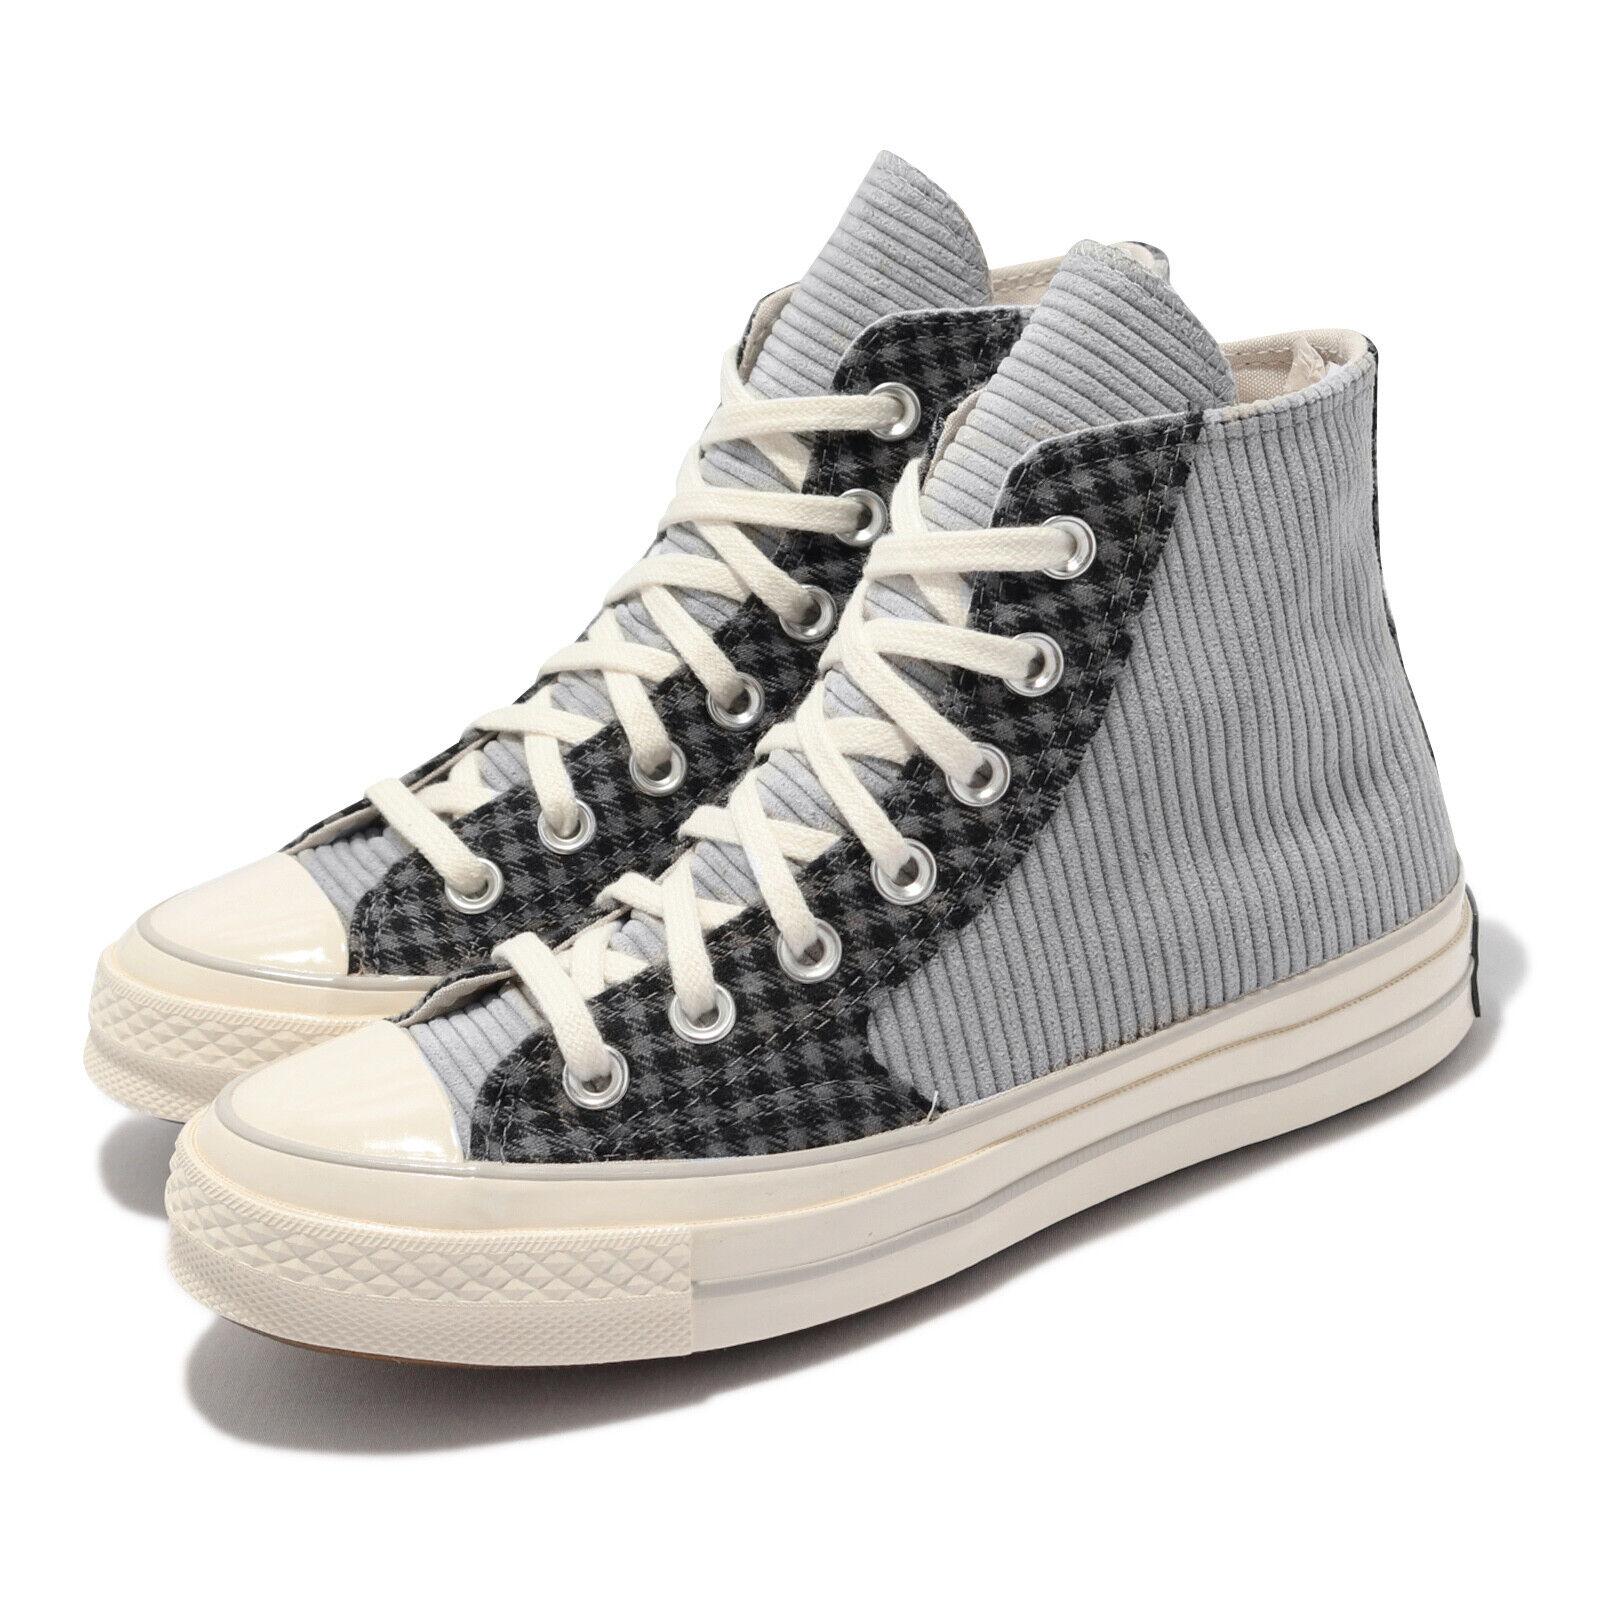 Converse Chuck 70 High Grey Black Men Unisex Casual Lifestyle Shoes 172496C